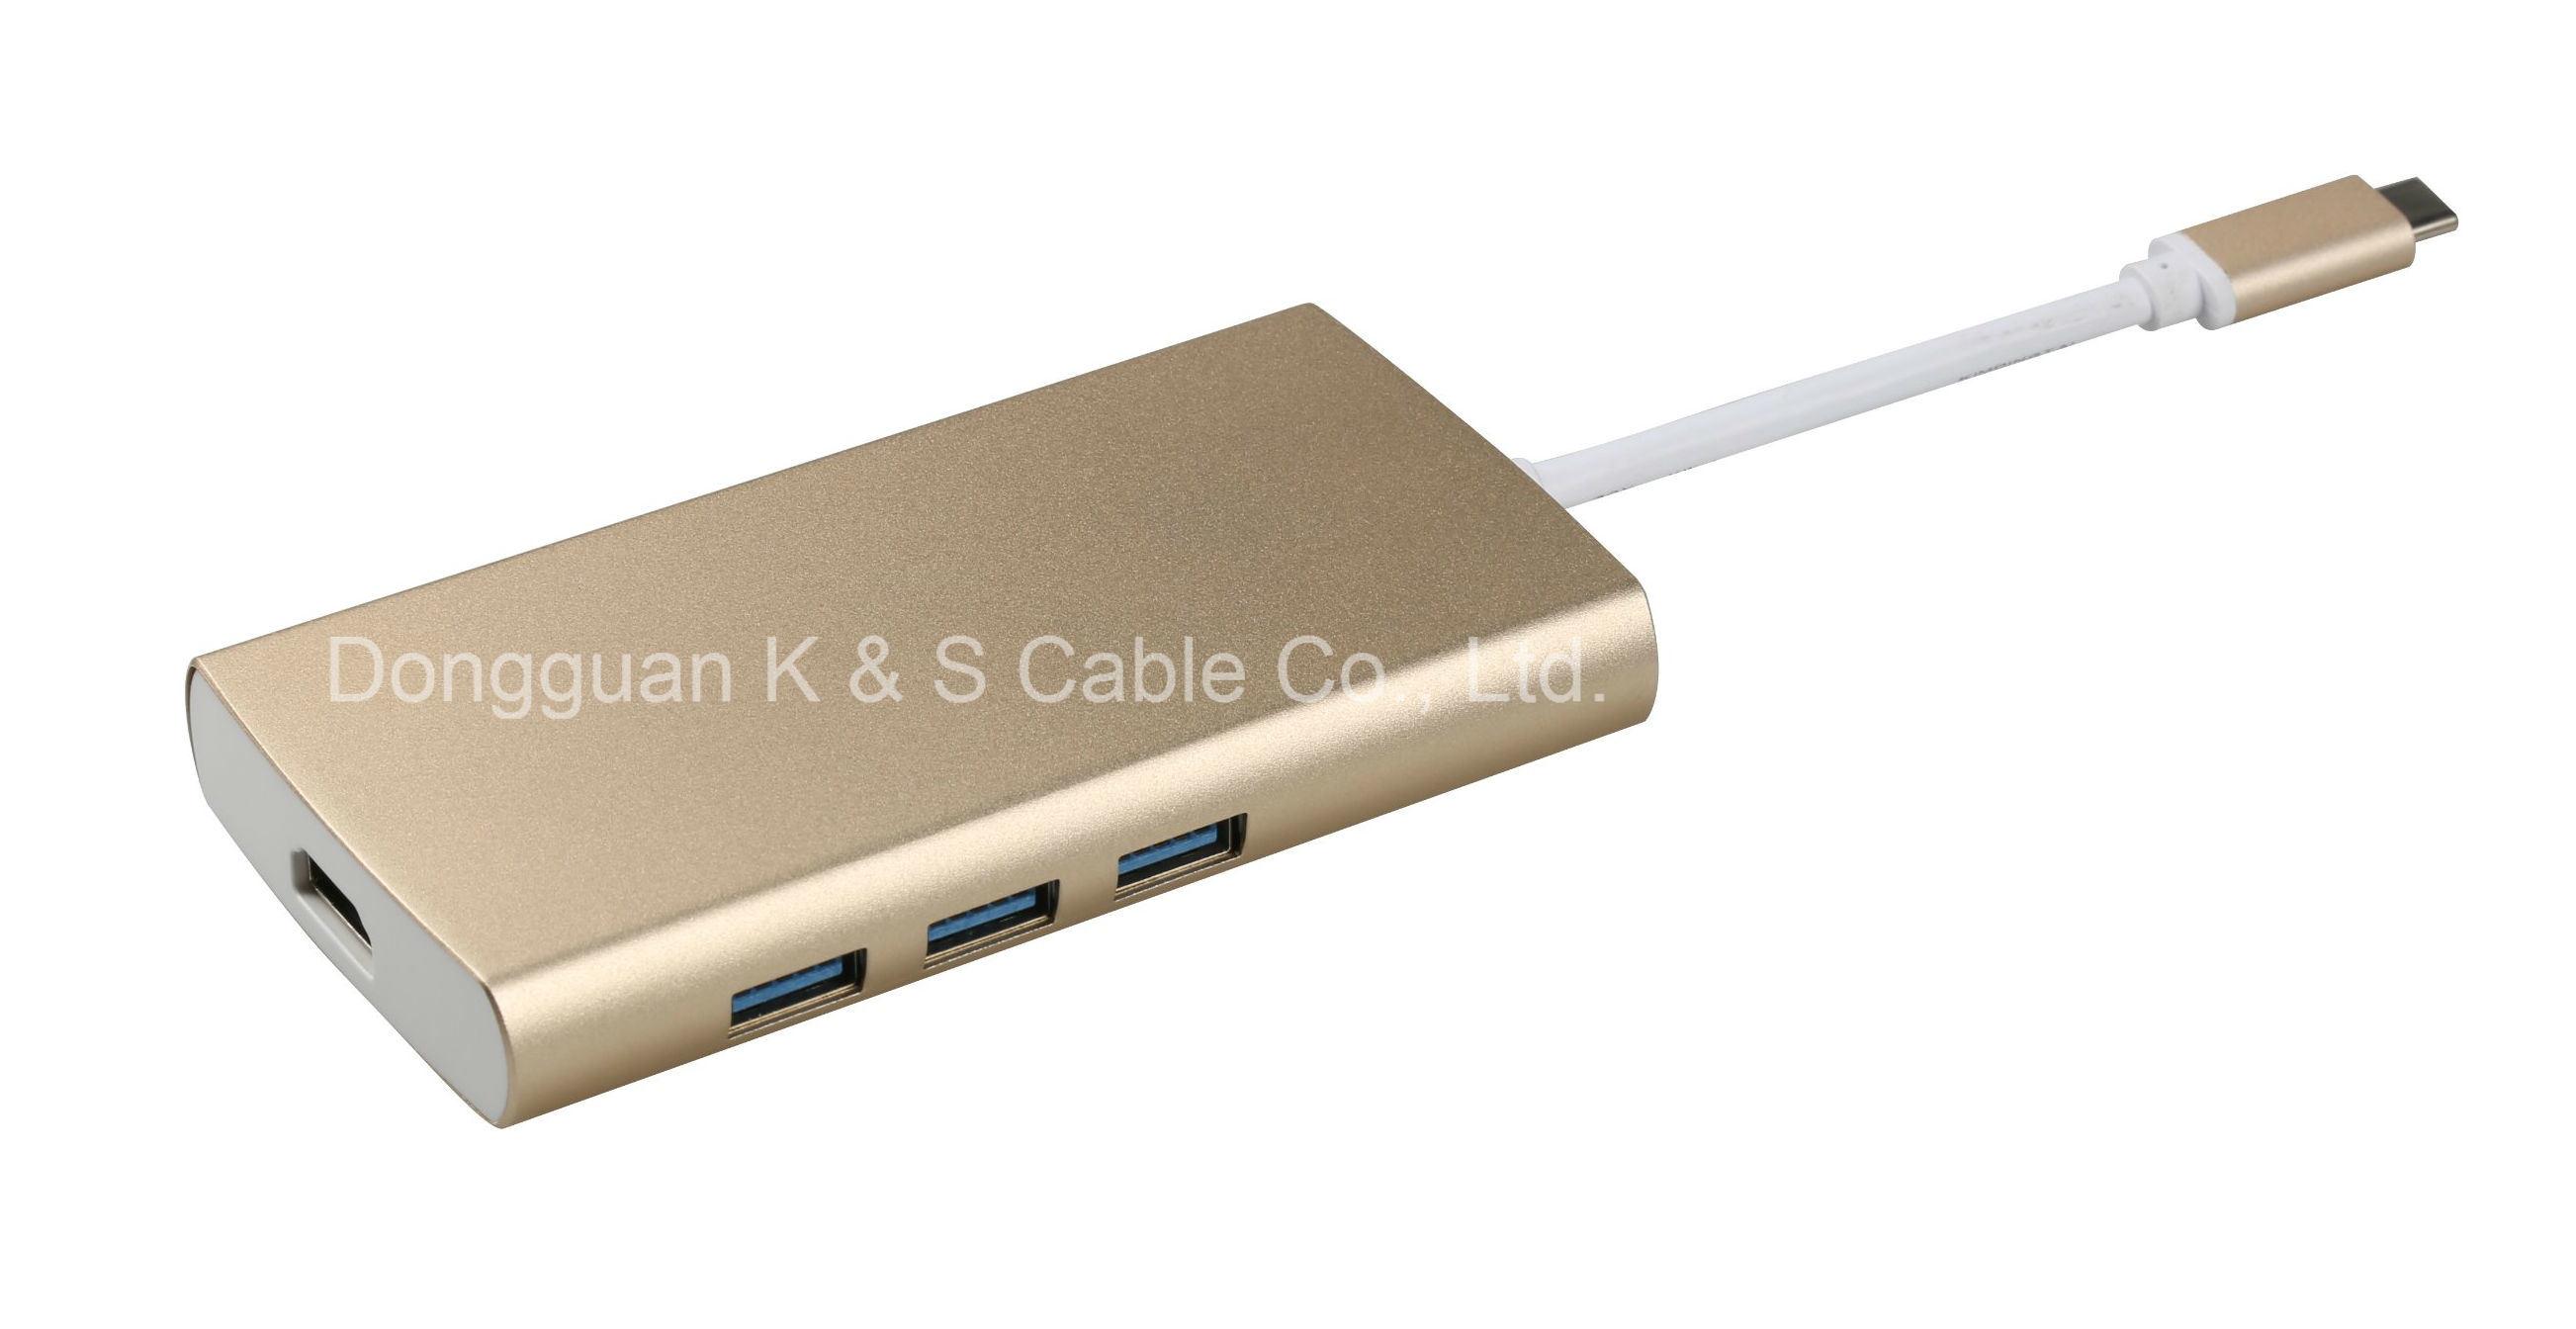 USB3.1 C to HDMI + USB3.0 3 Ports + USB C Adapter